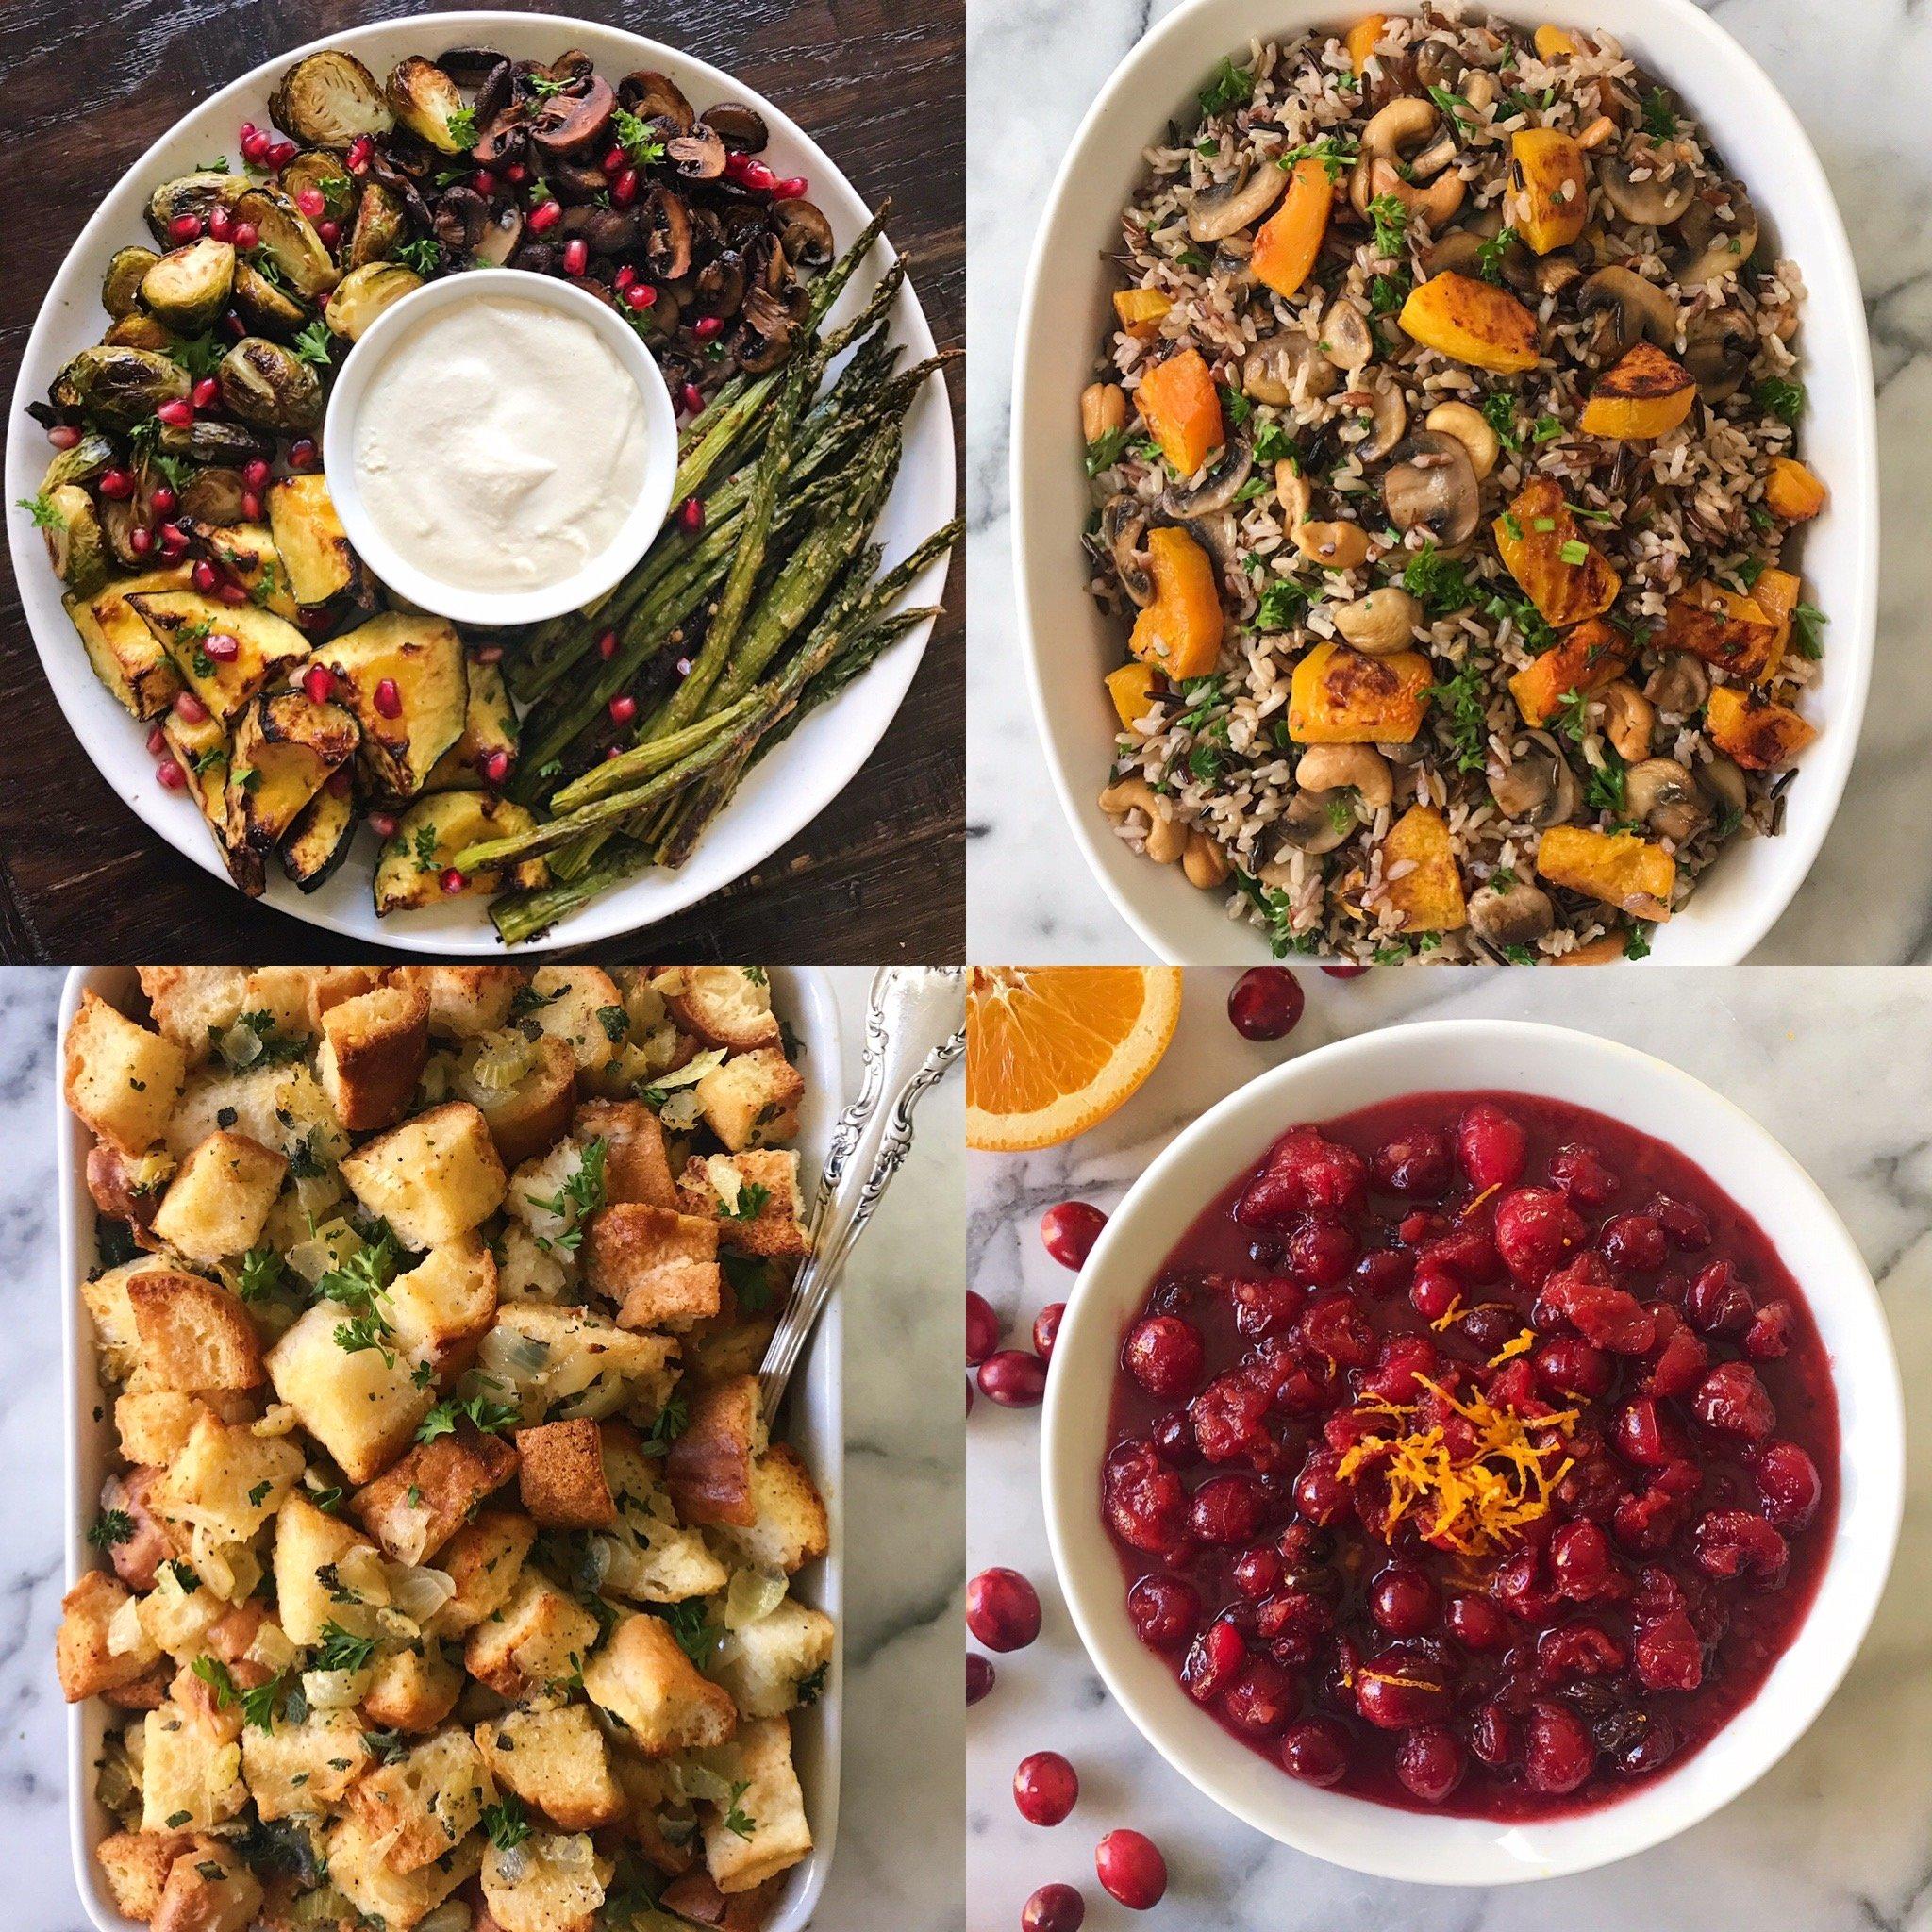 Gluten Free Thanksgiving 2020 www.healthygffamily.com